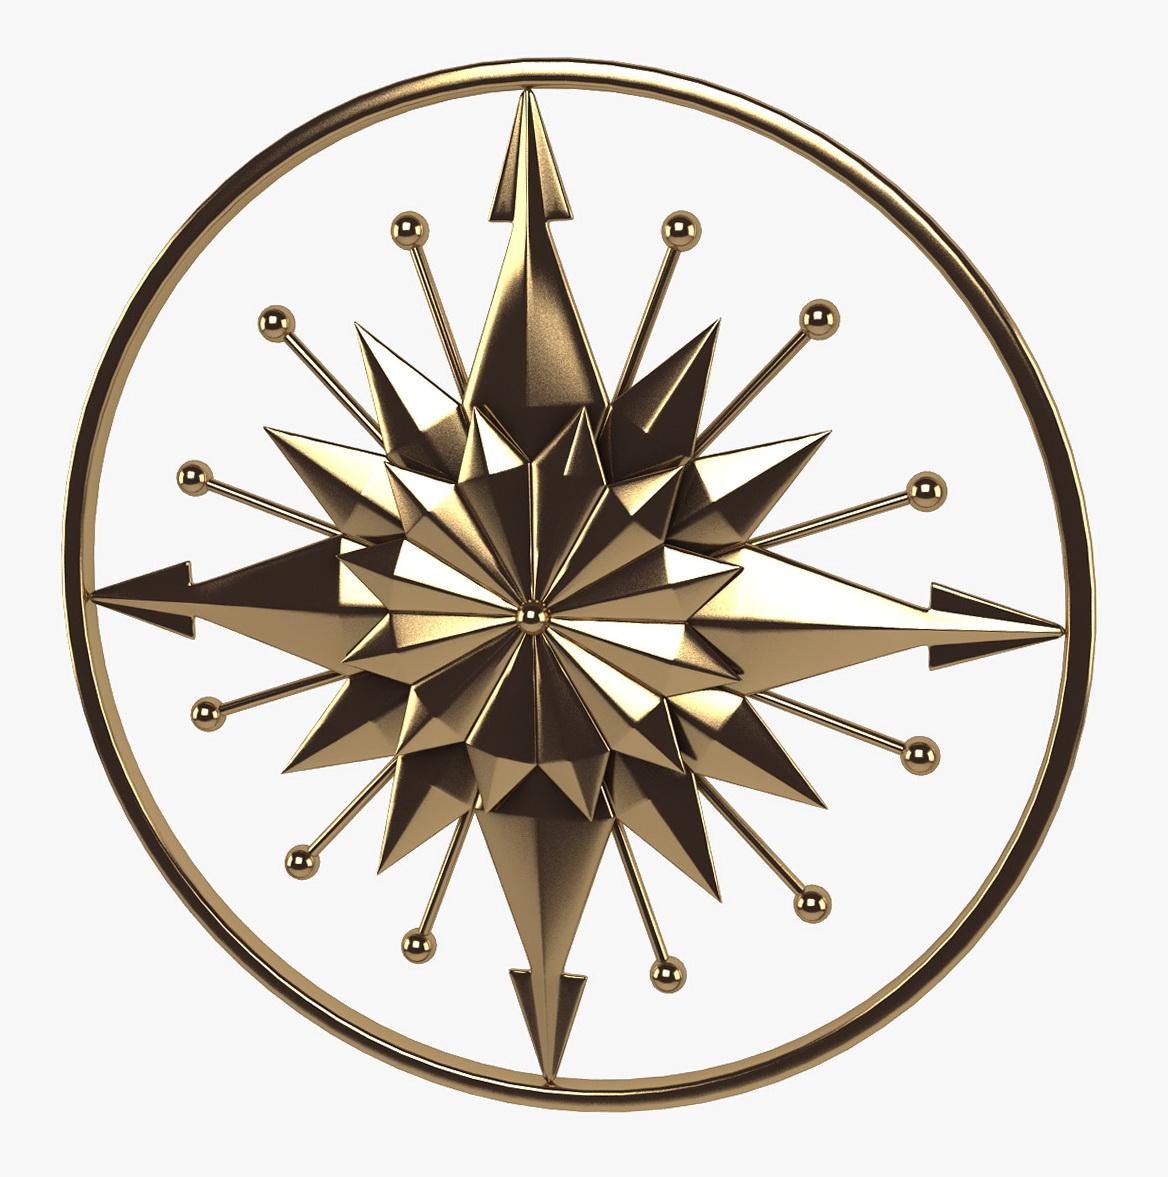 Compass Decorative Wall Art